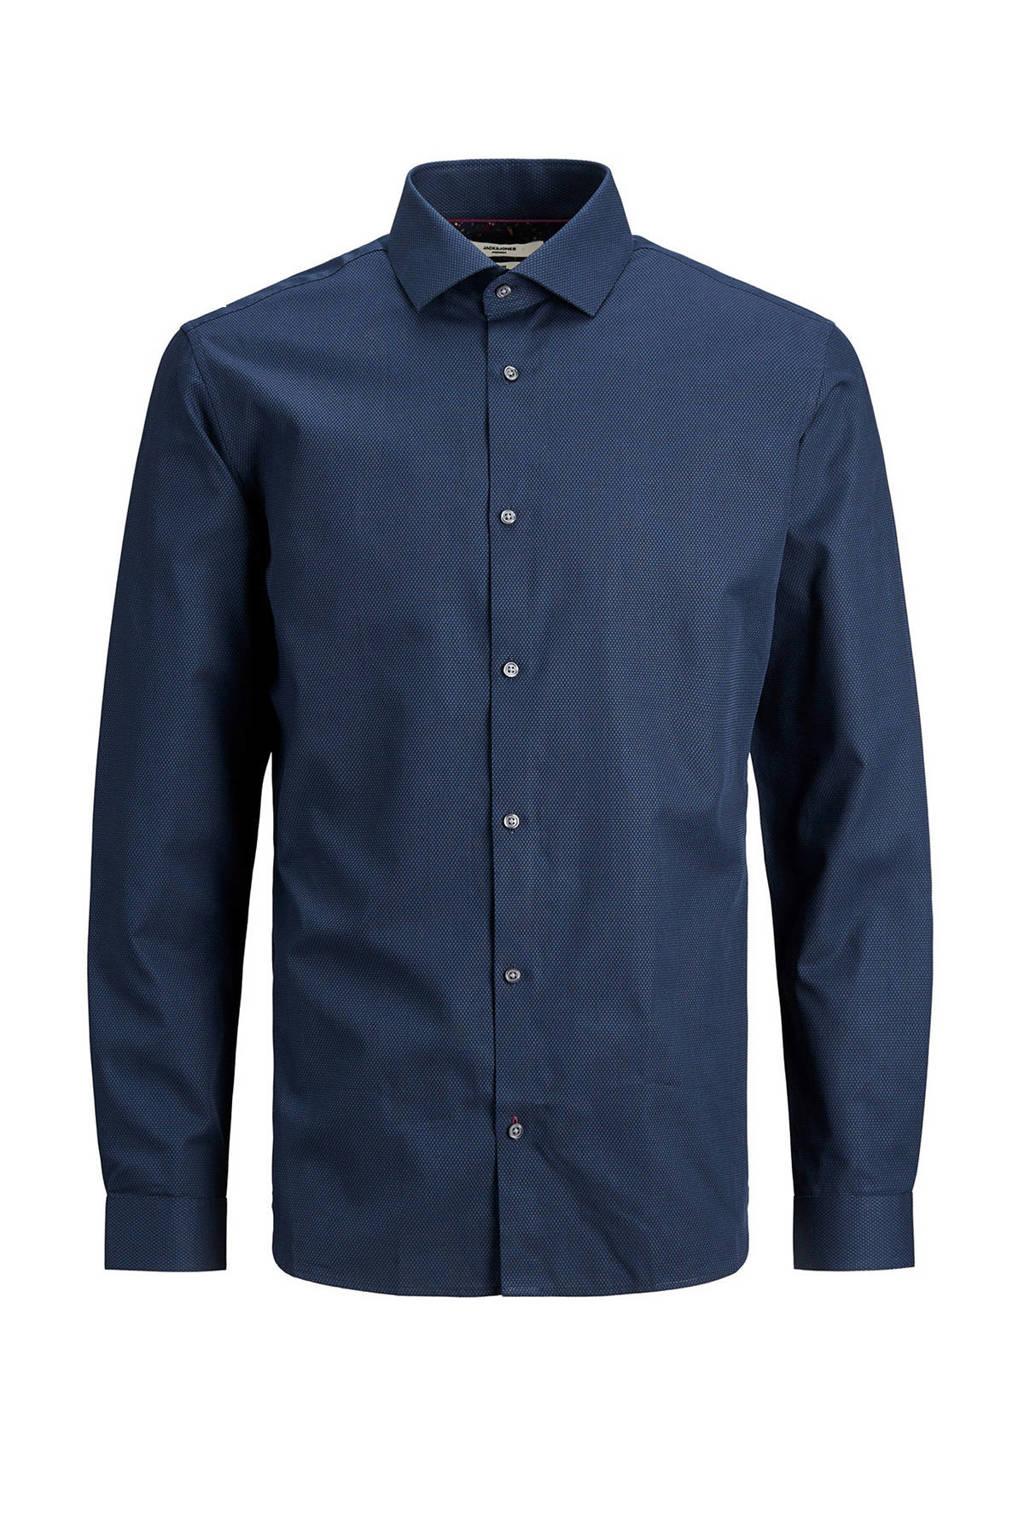 JACK & JONES PREMIUM slim fit overhemd donkerblauw, Donkerblauw